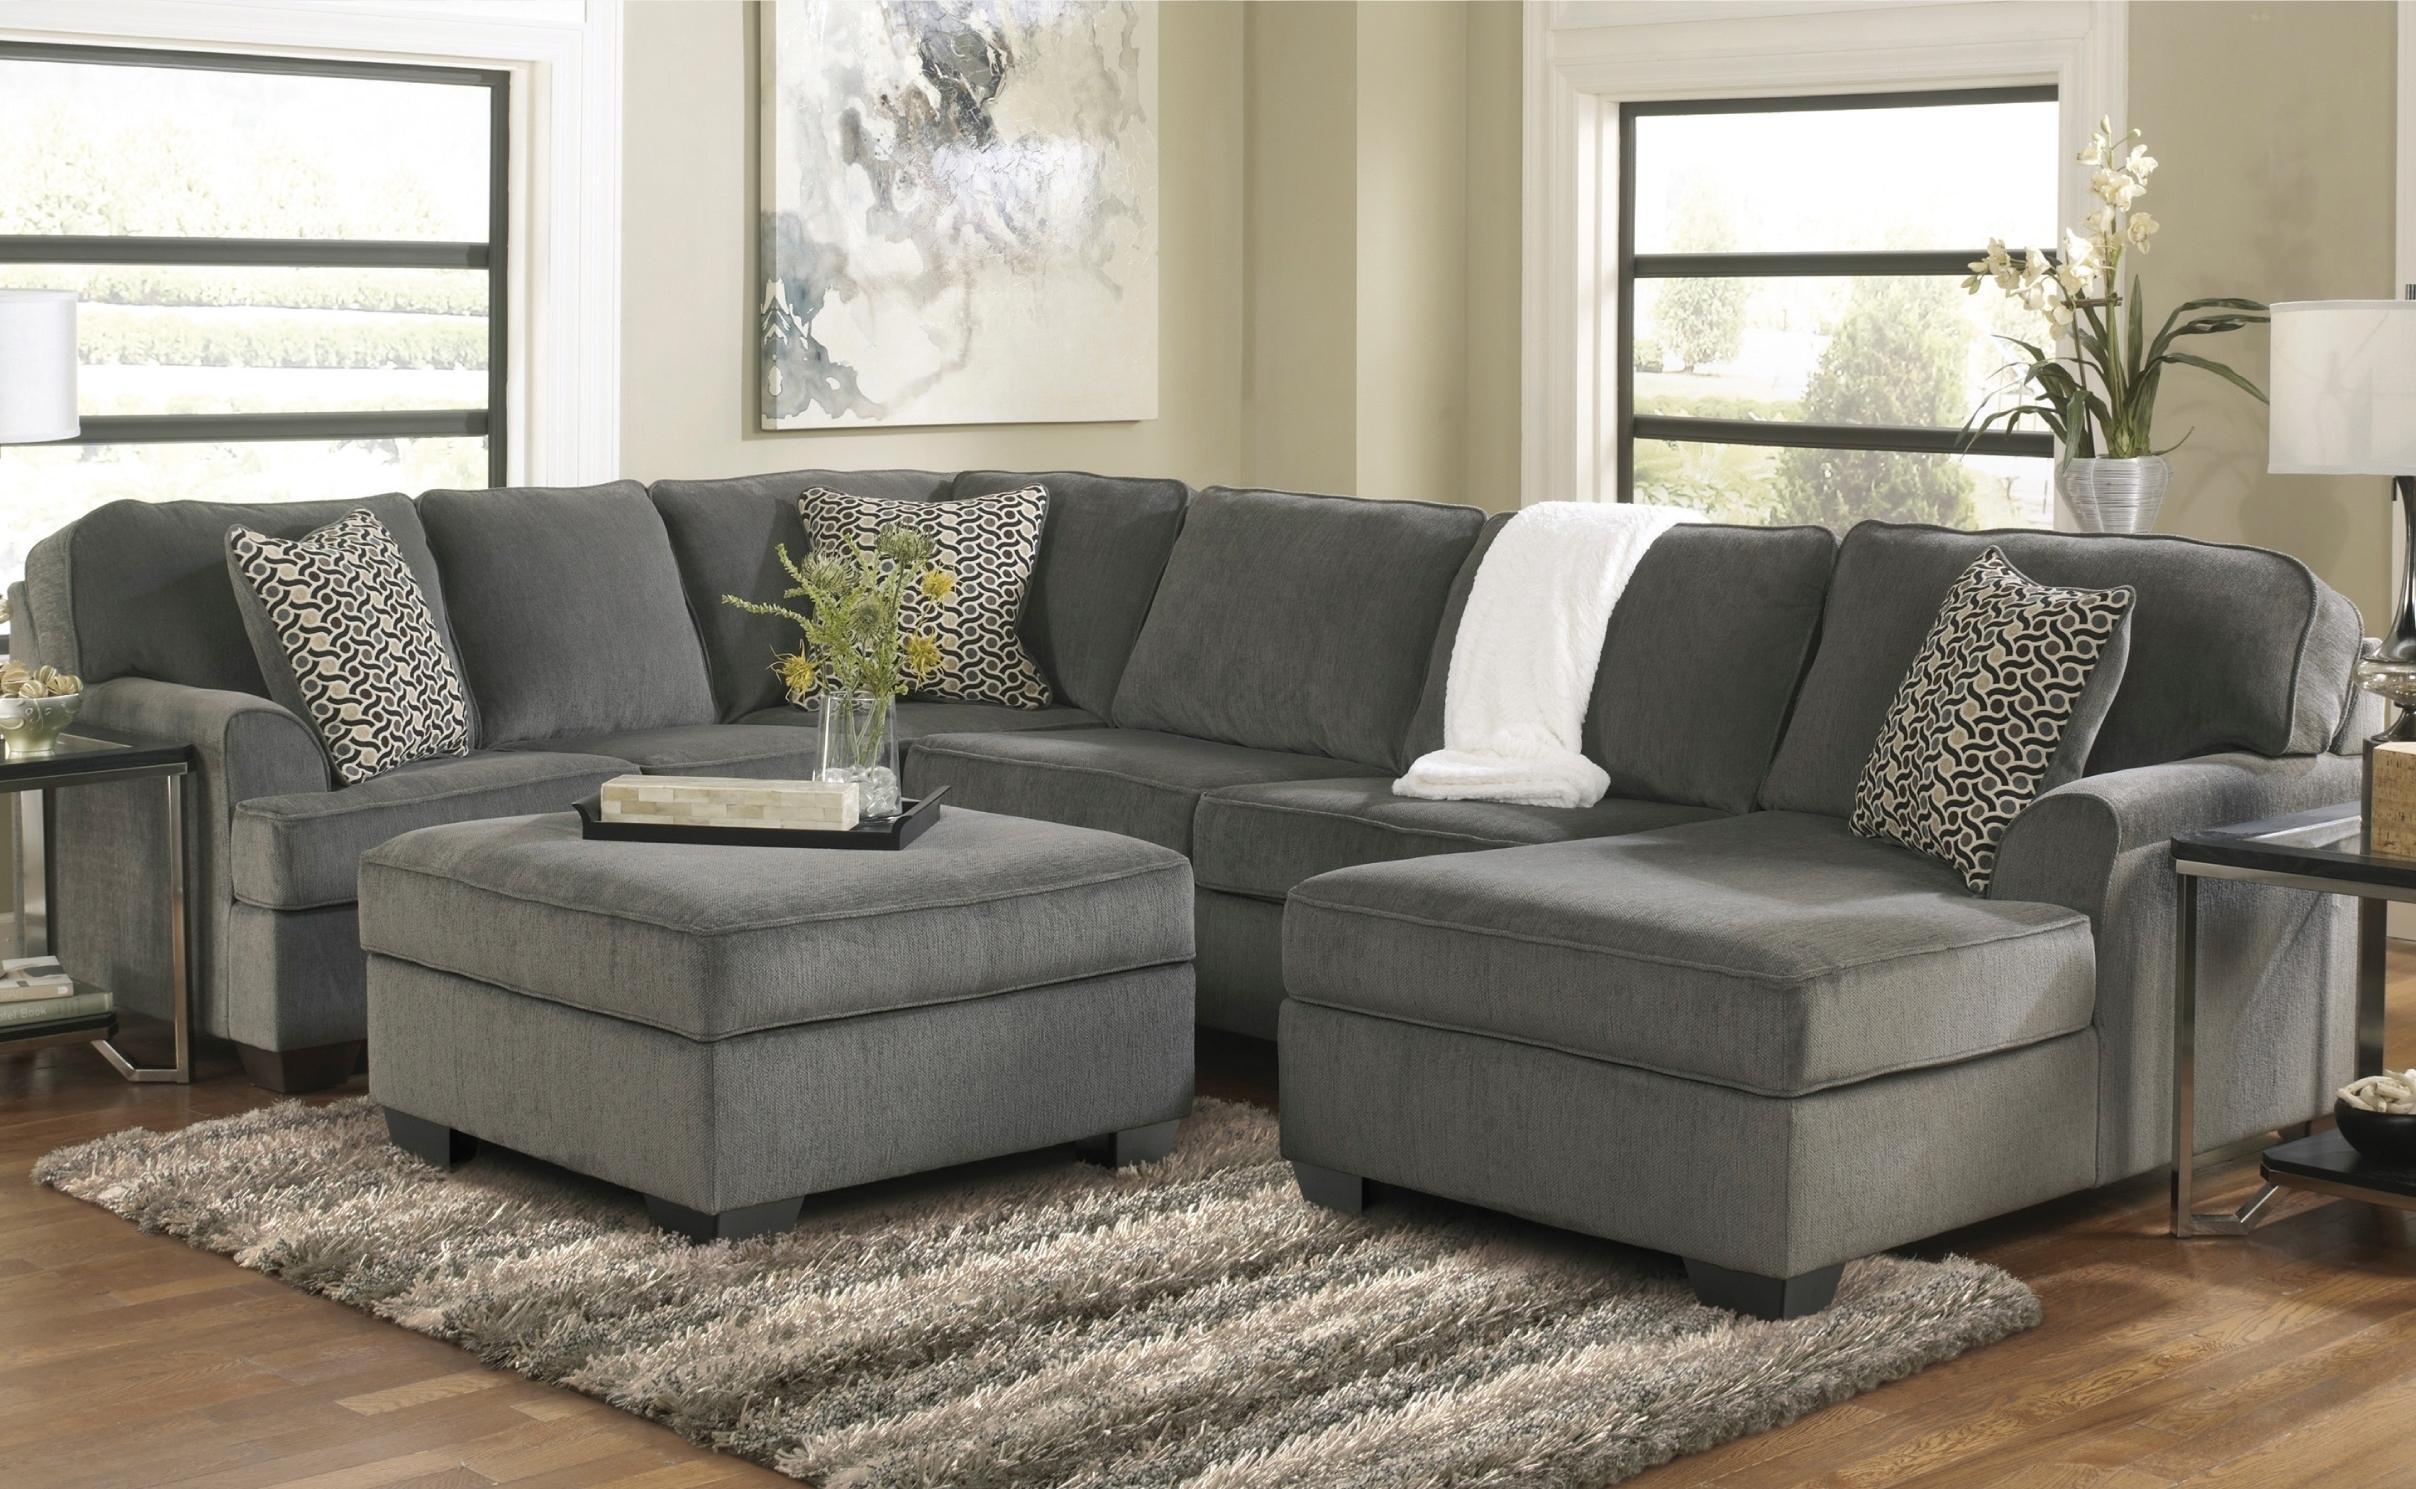 Leather Sectional Sofas Raleigh Nc | Ezhandui Regarding Raleigh Sectional Sofas (Image 9 of 10)